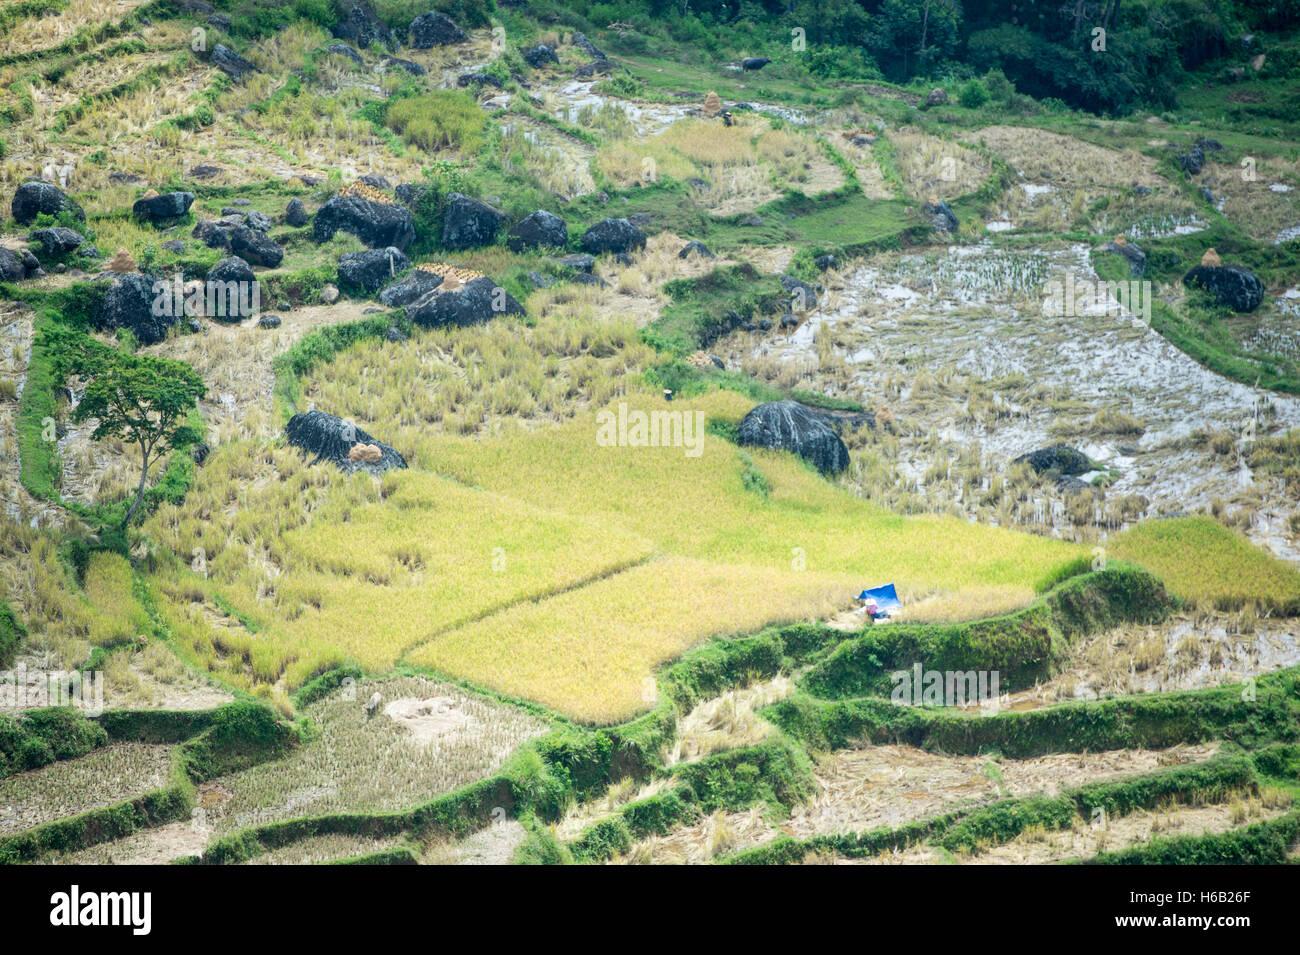 Paddy Field at North Toraja, Indonesia. - Stock Image